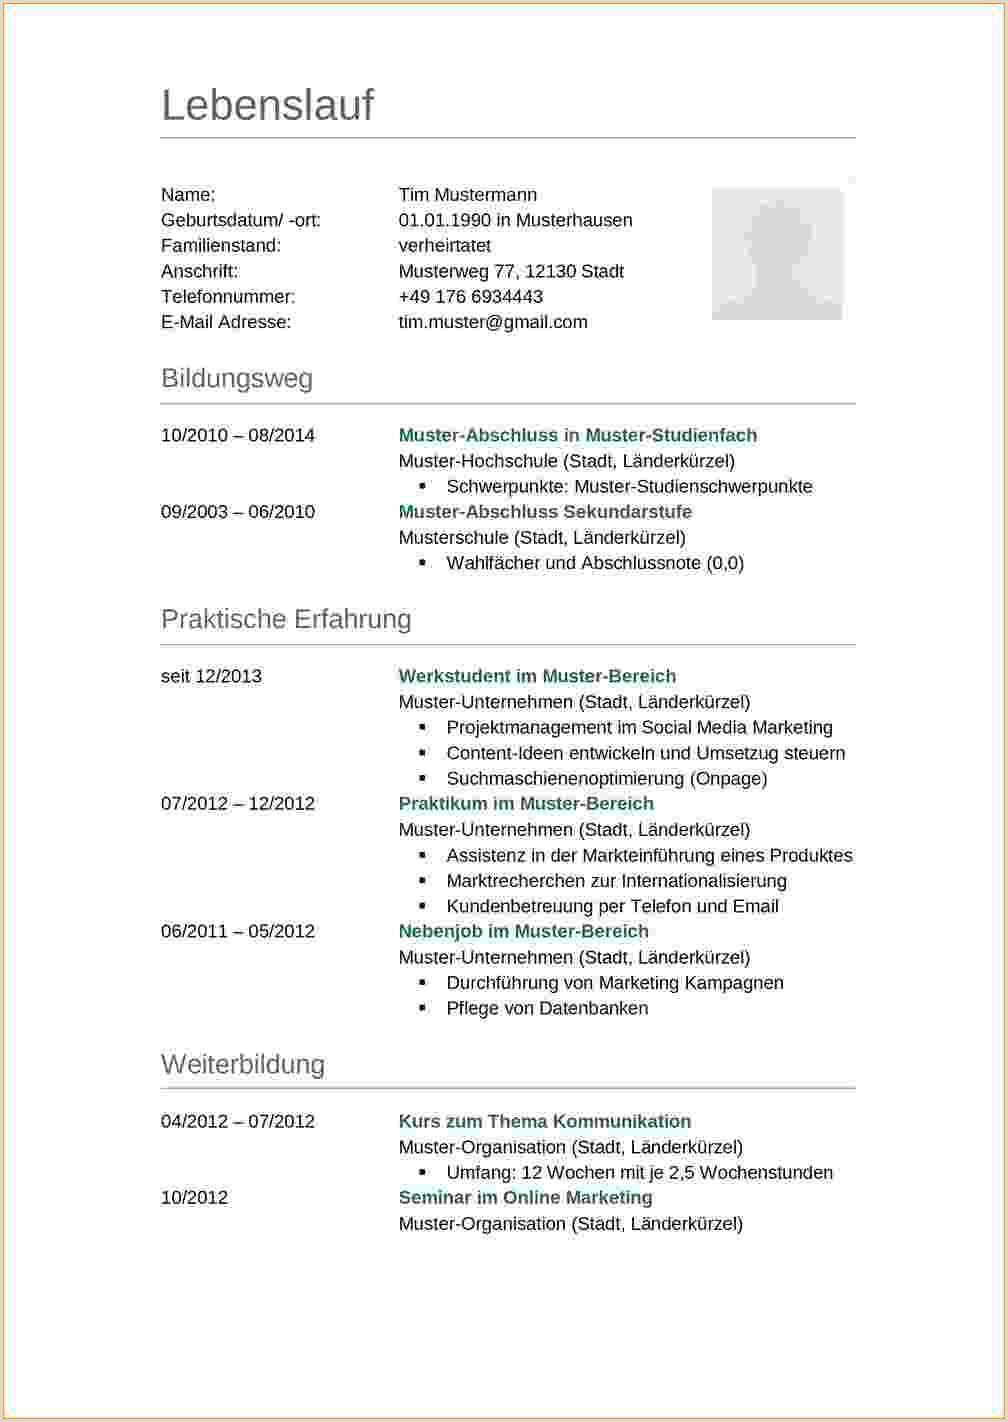 Lebenslauf Muster Umsonst In 2020 Resume Template Free Resume Template Medical Office Design